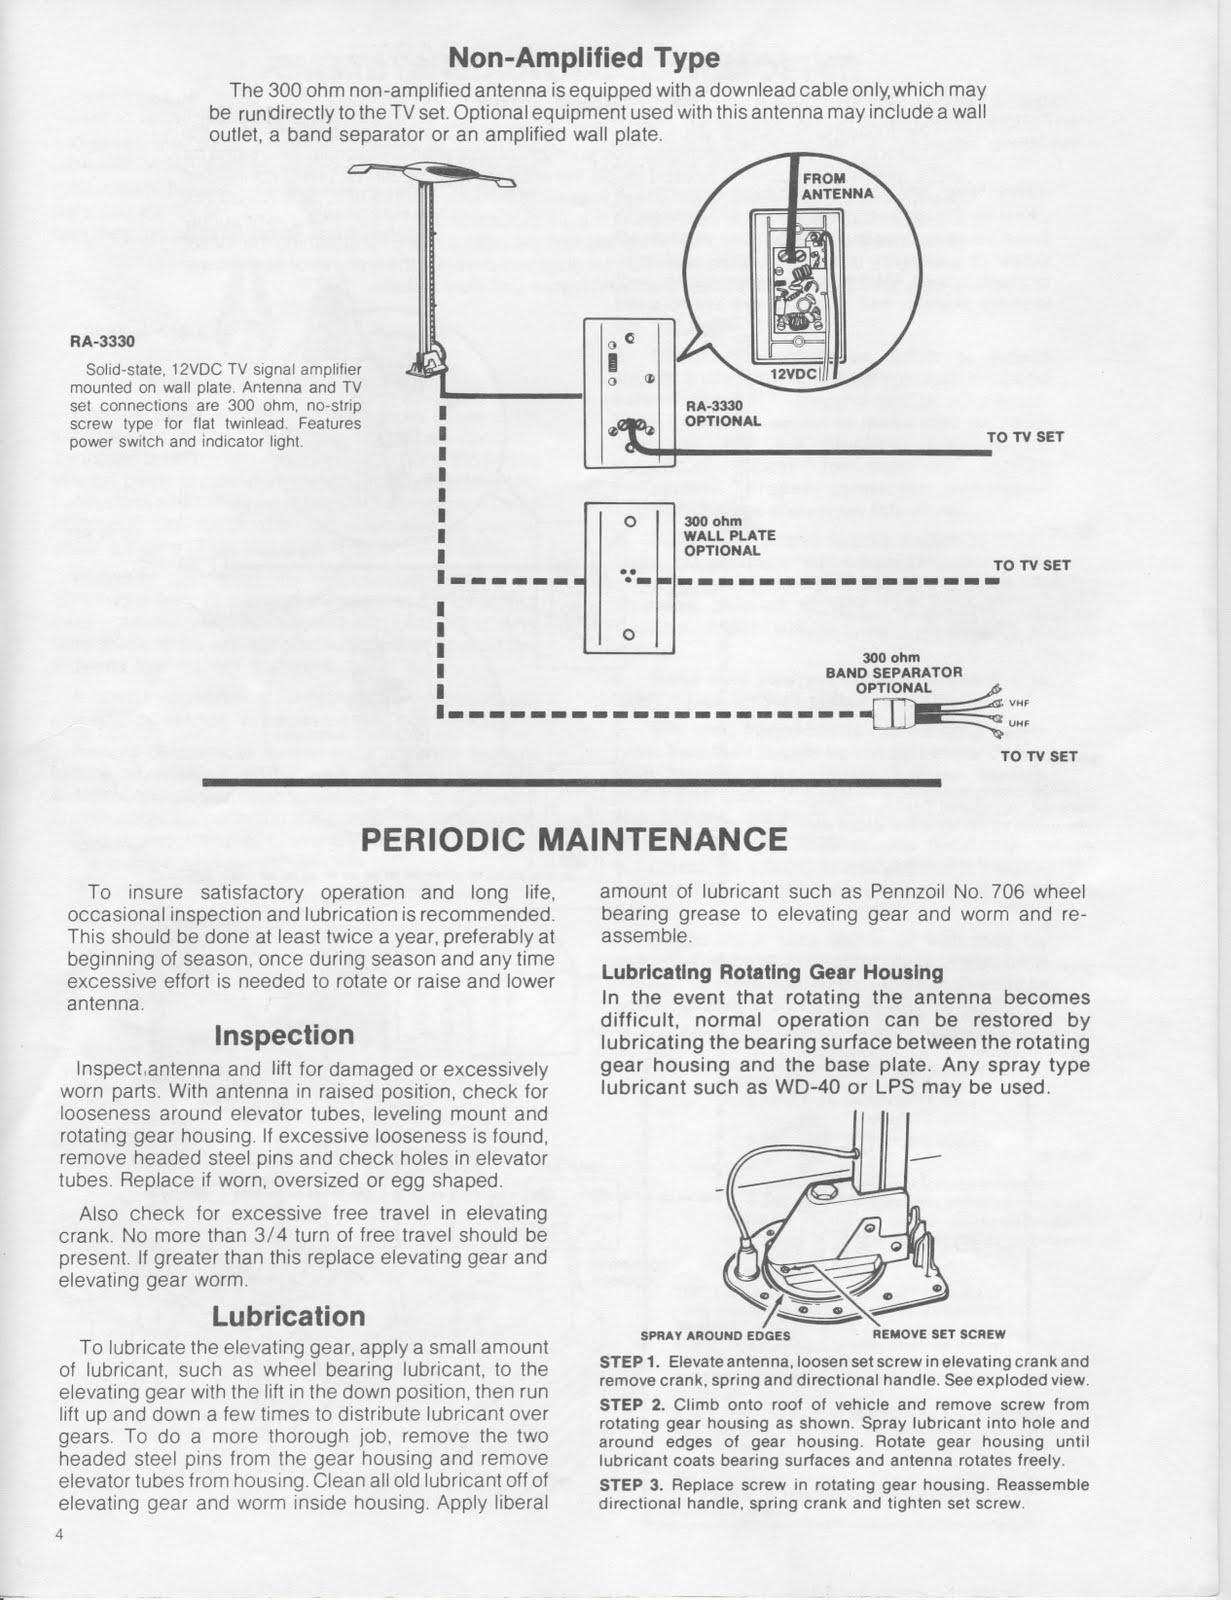 rv tv antenna booster wiring diagram 1999 gmc sierra trailer 18 images